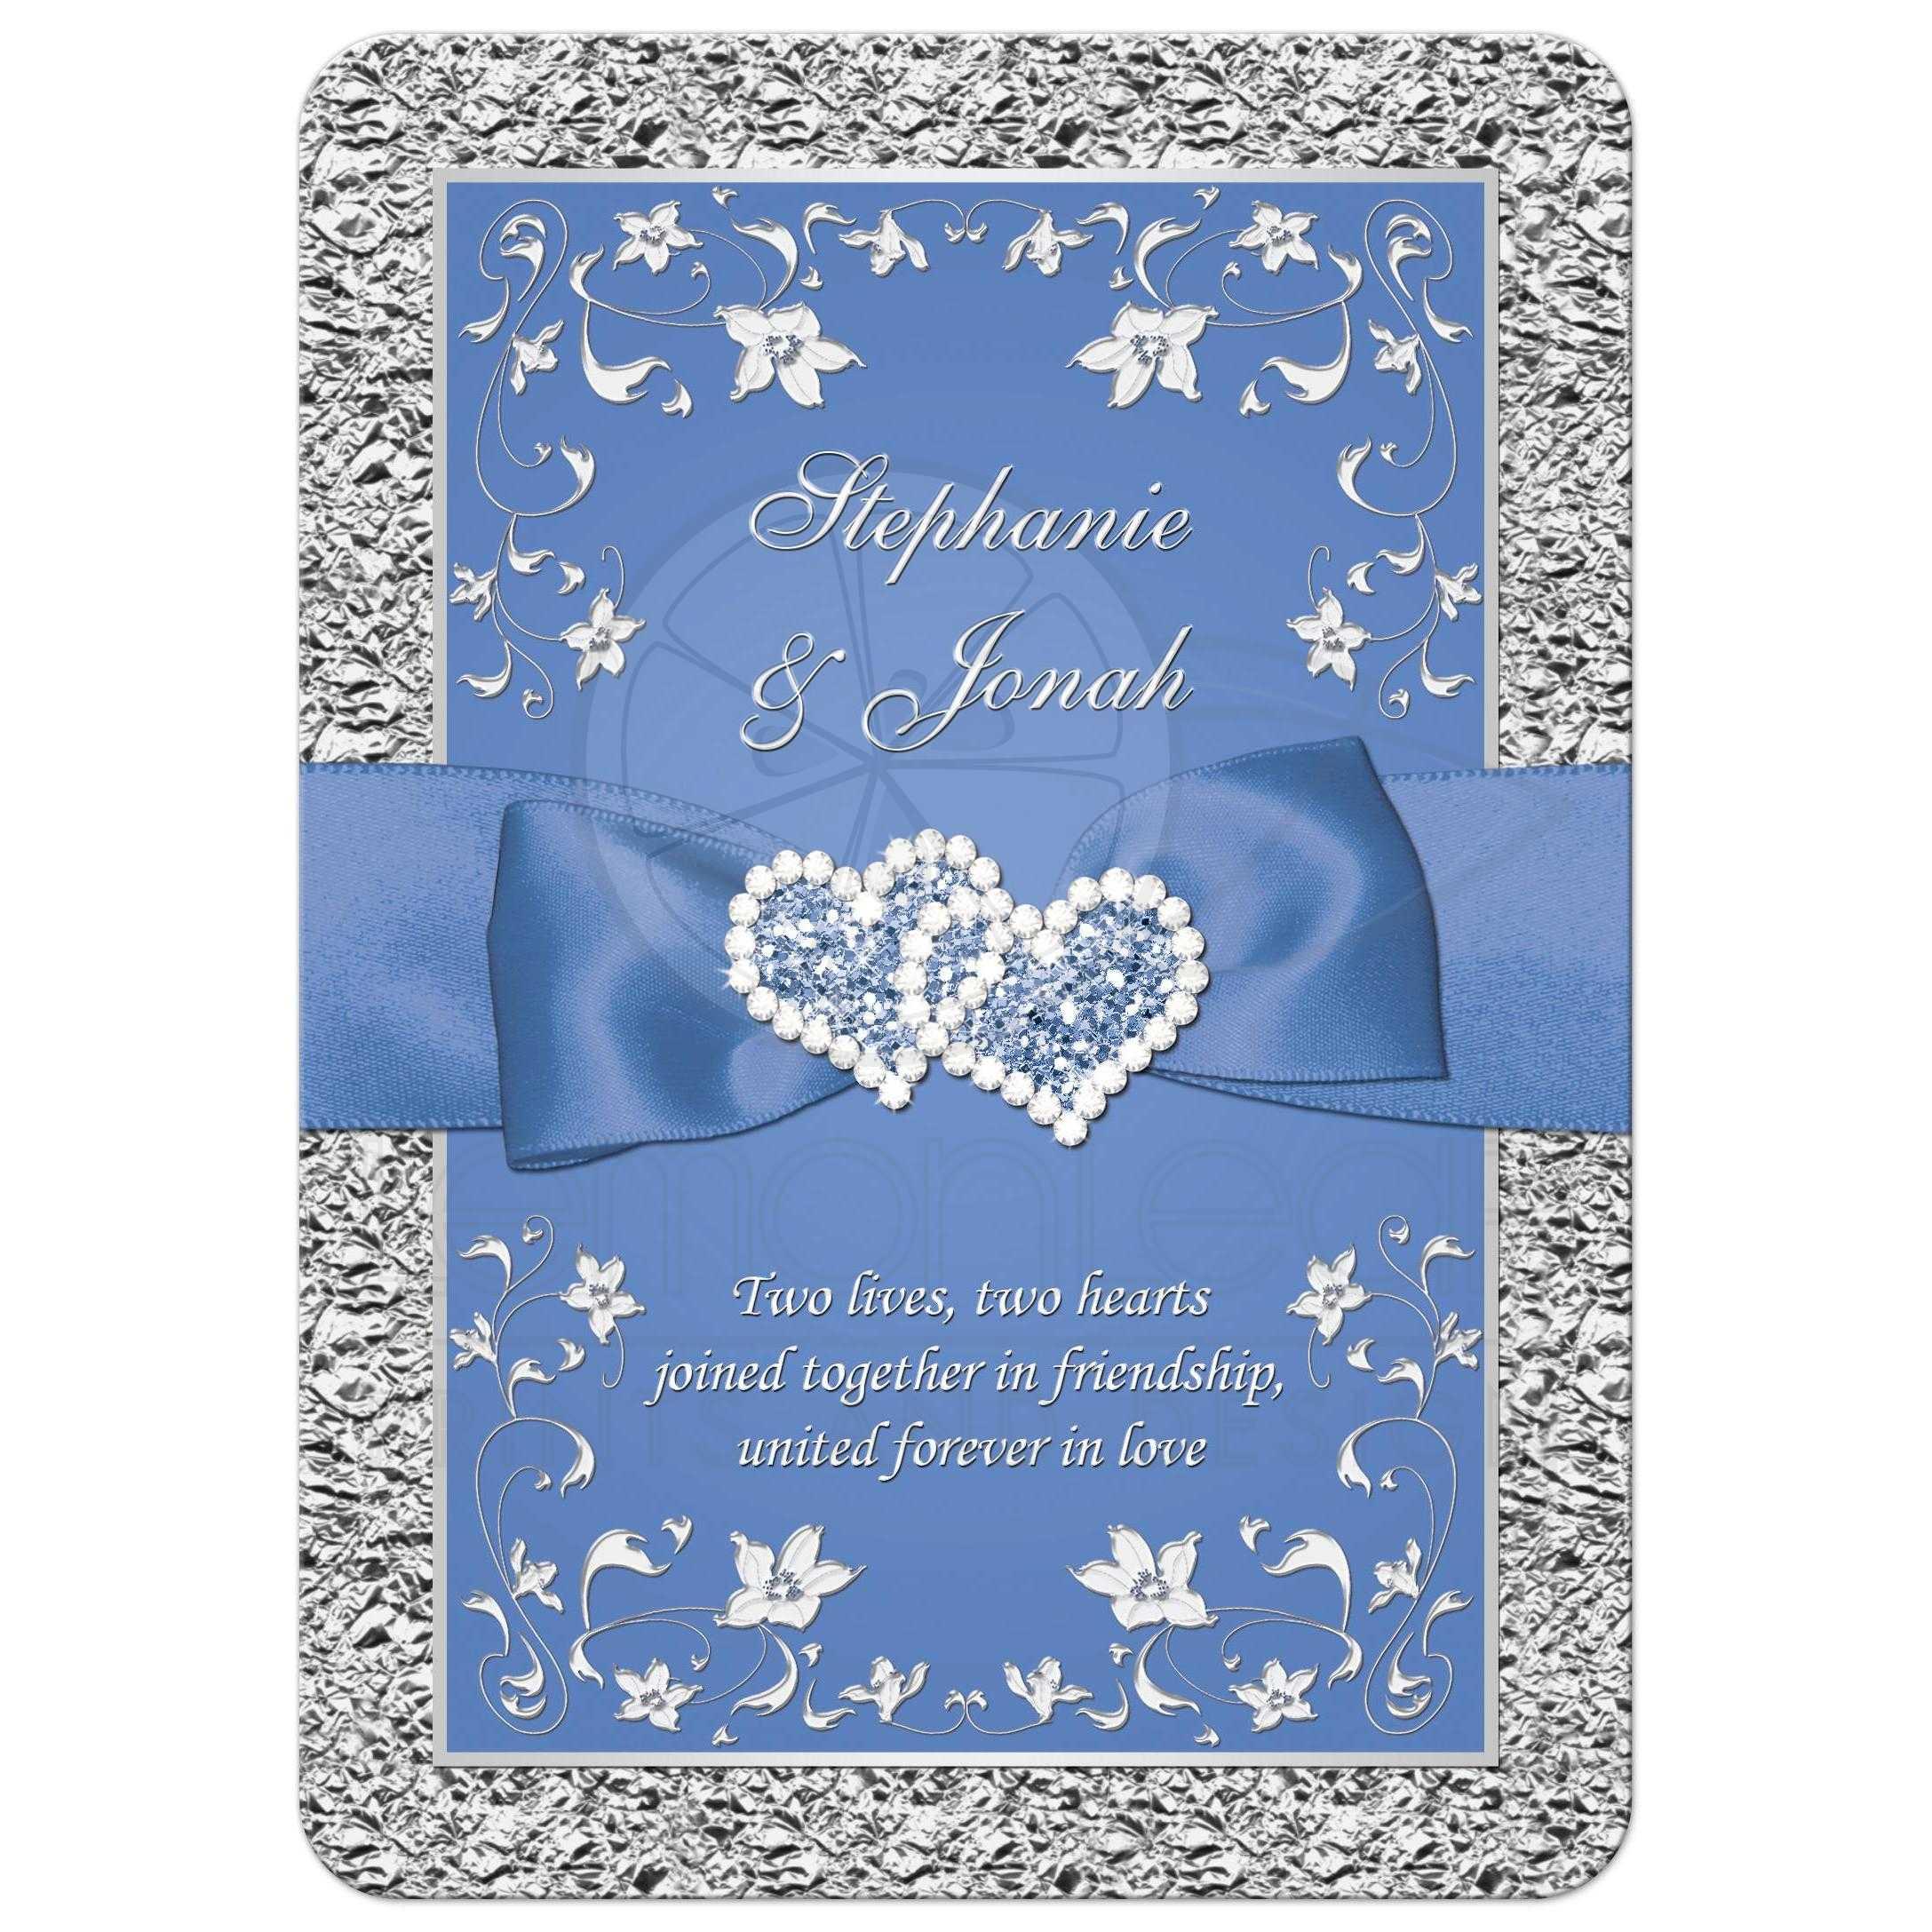 Wedding Invitations Blue And Silver: Cornflower Blue And Silver Gray Floral Wedding Invitation